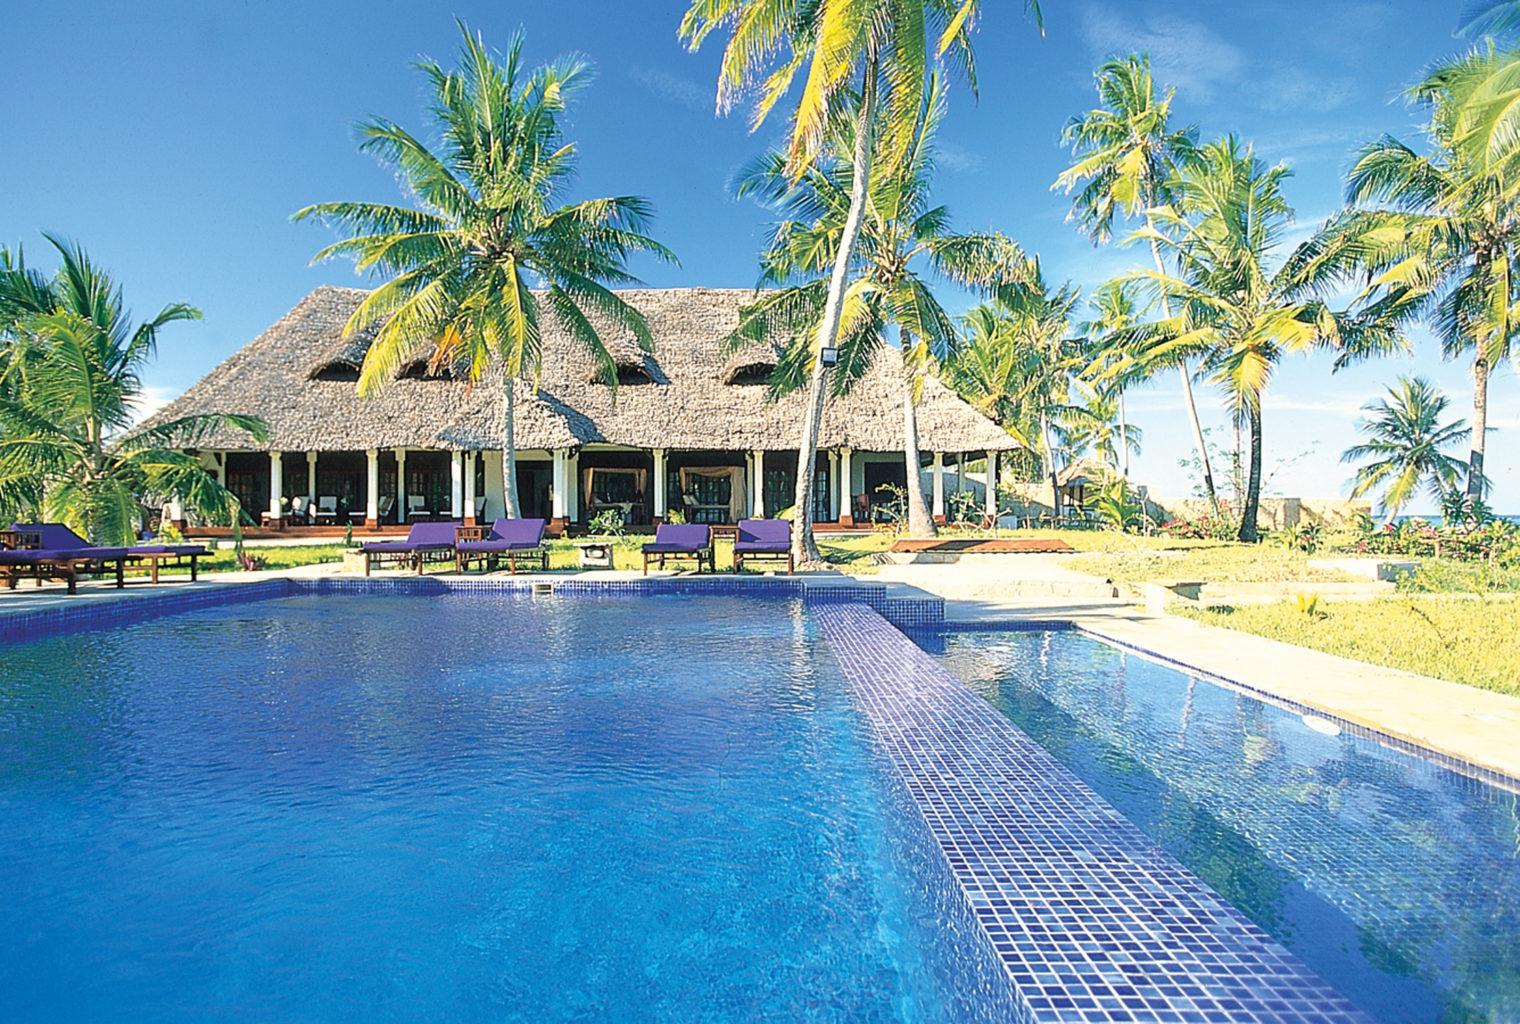 The Palms Tanzania Pool